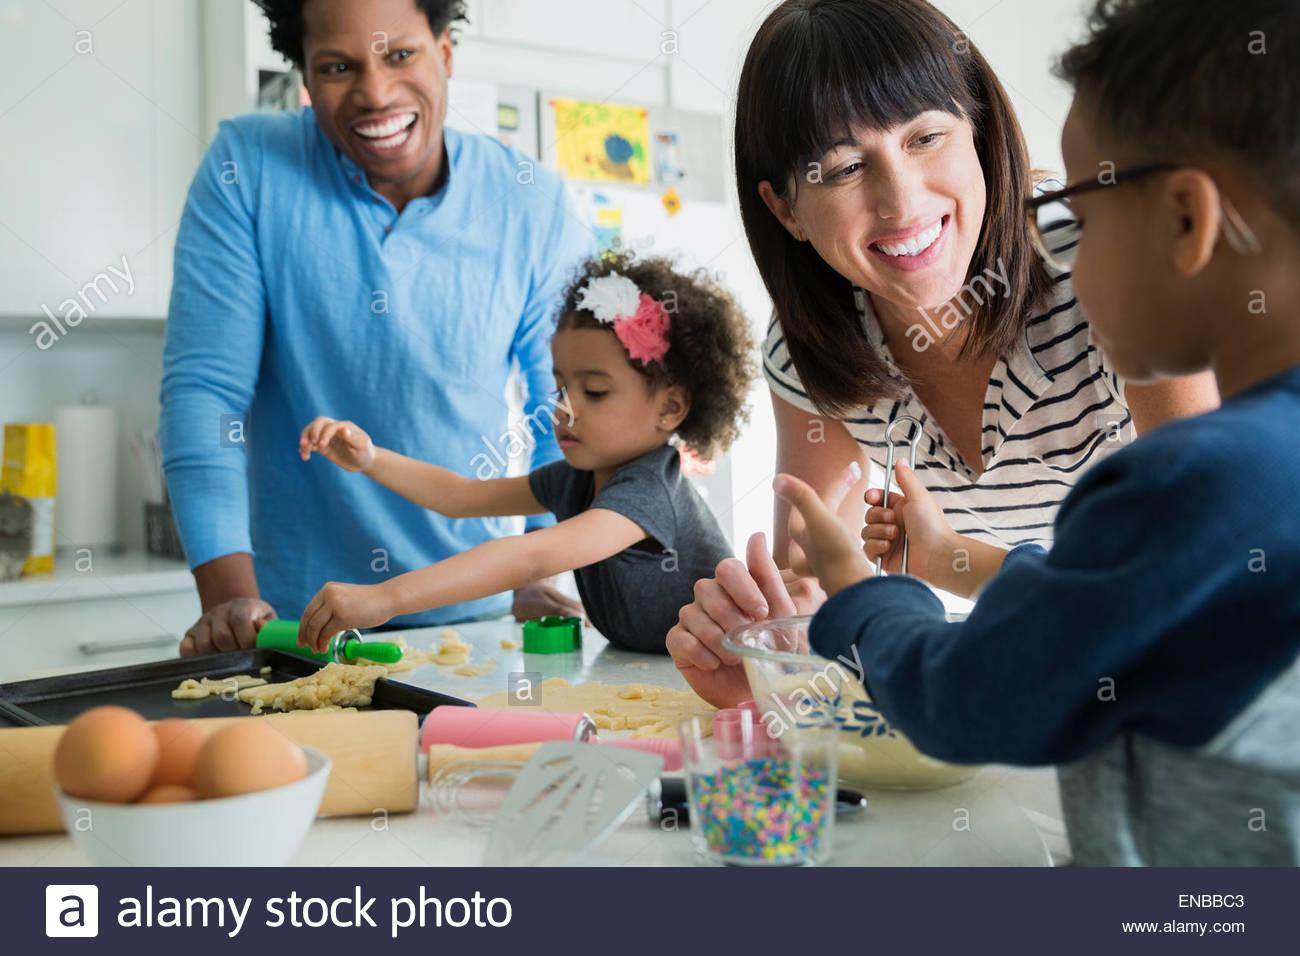 Family baking in kitchen - Stock Image